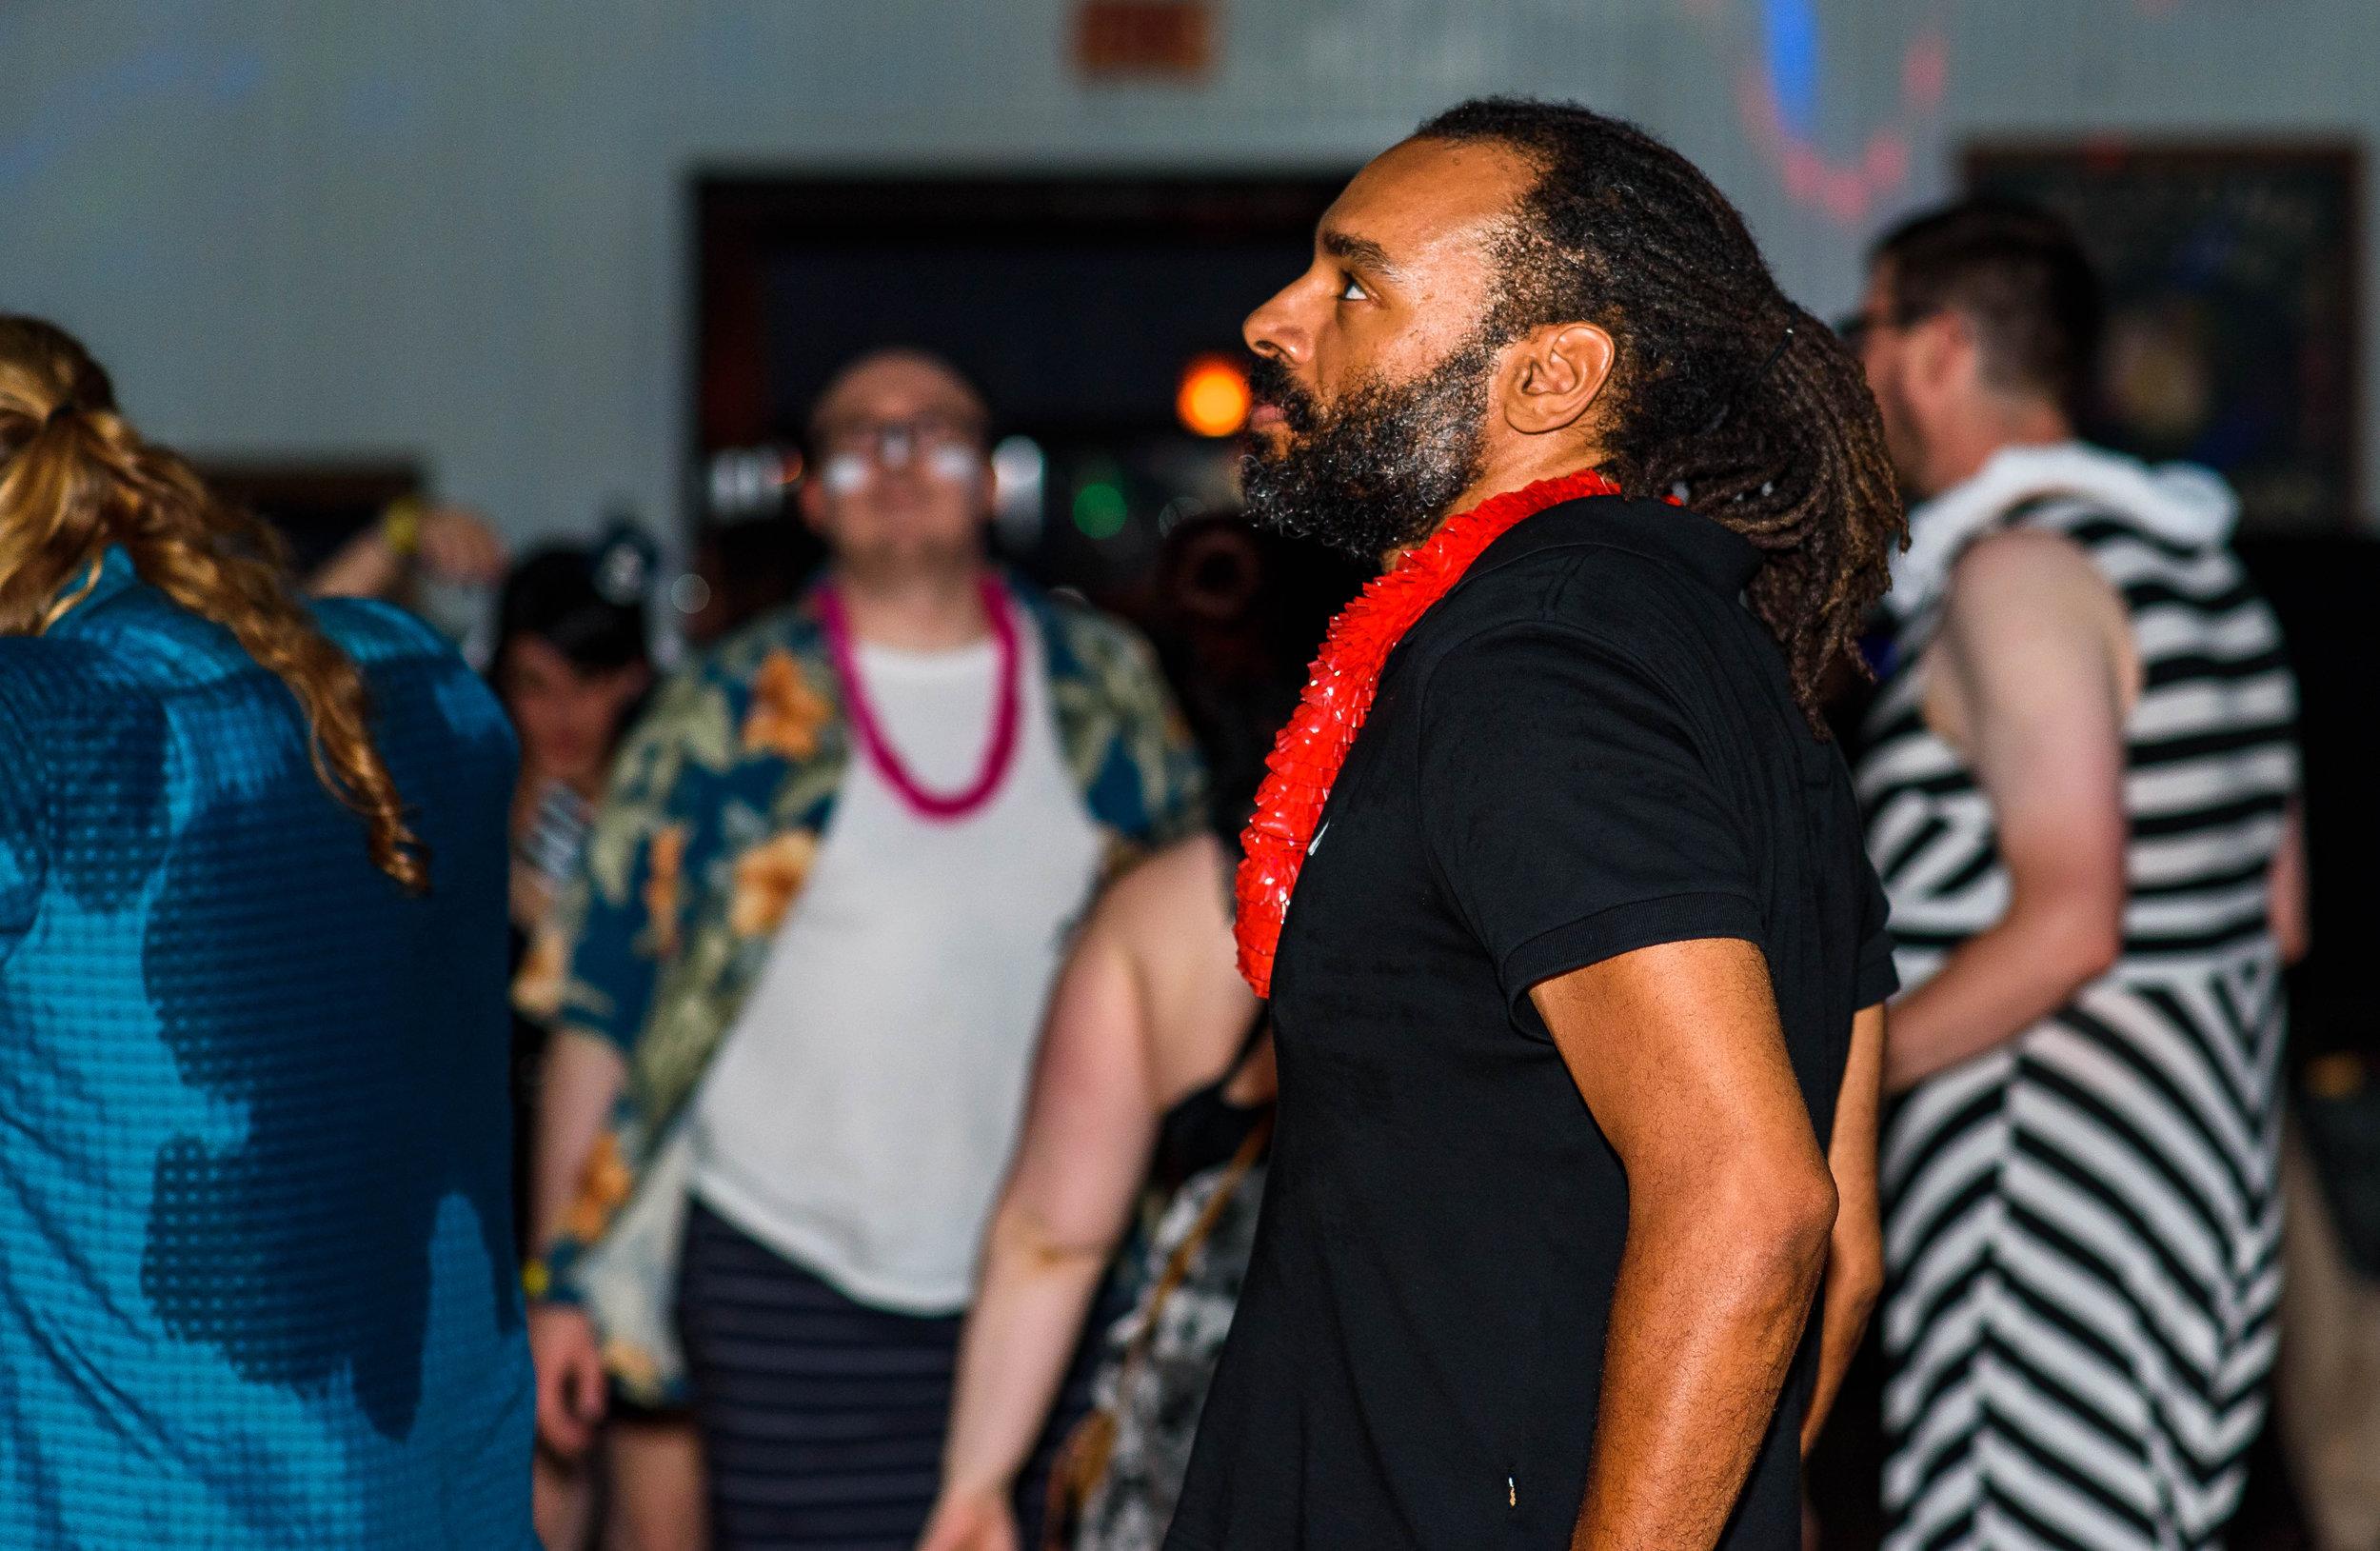 2019-TheHaven Club - Beach Party (46).jpg